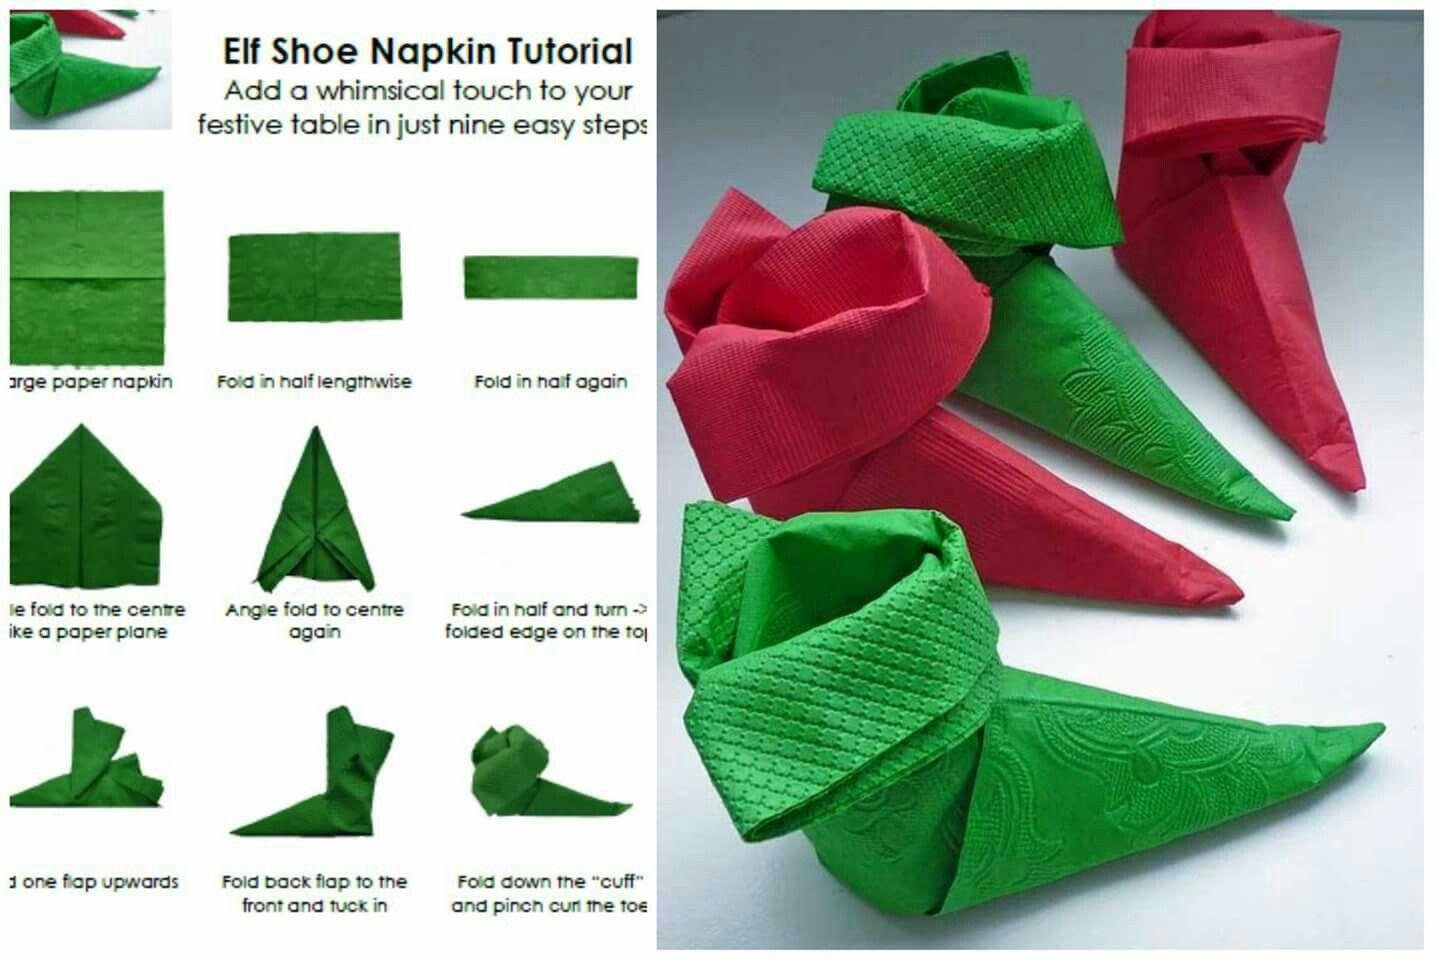 These Are So Cute Napkins Diy Napkins Christmas Napkin Folding